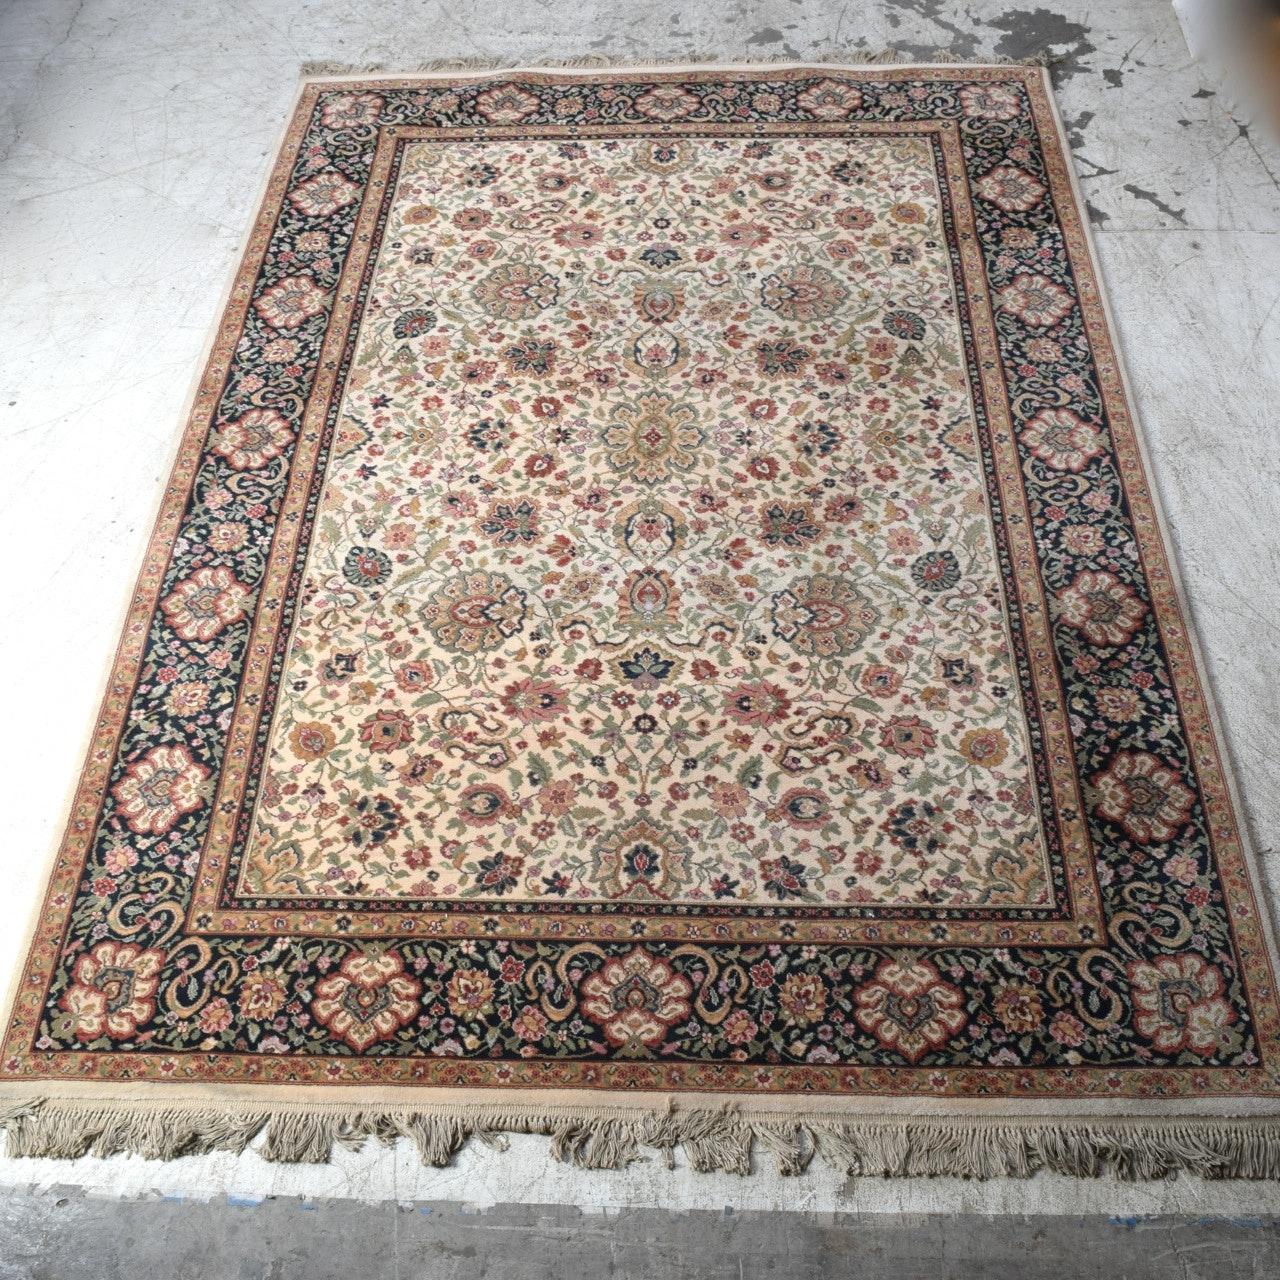 Machine Made Karastan Indo-Kirman Wool Area Rug